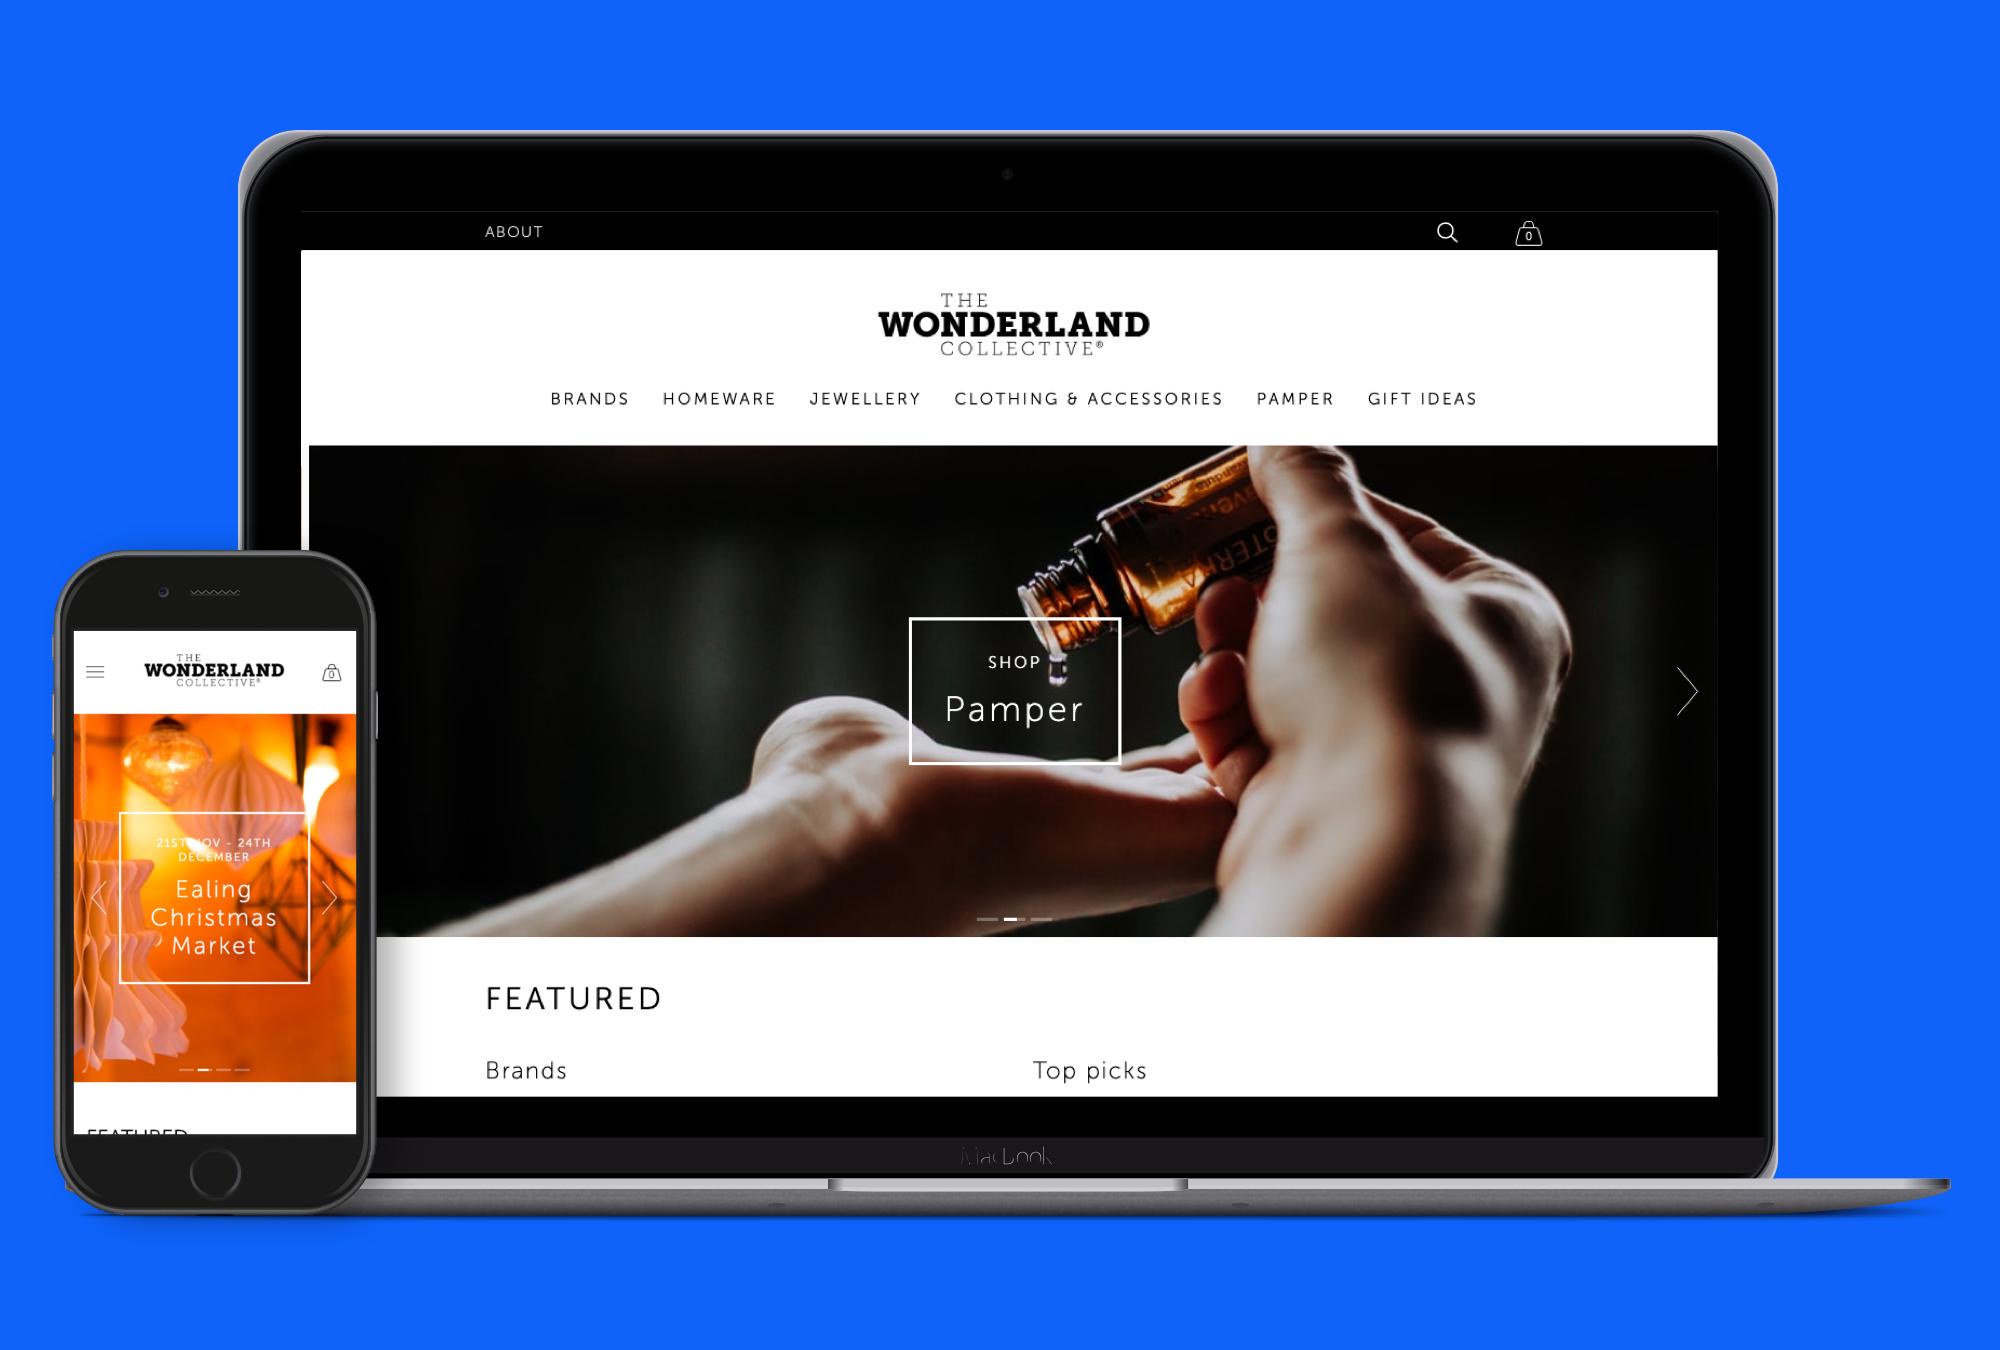 The Wonderland Collective - Website design and build